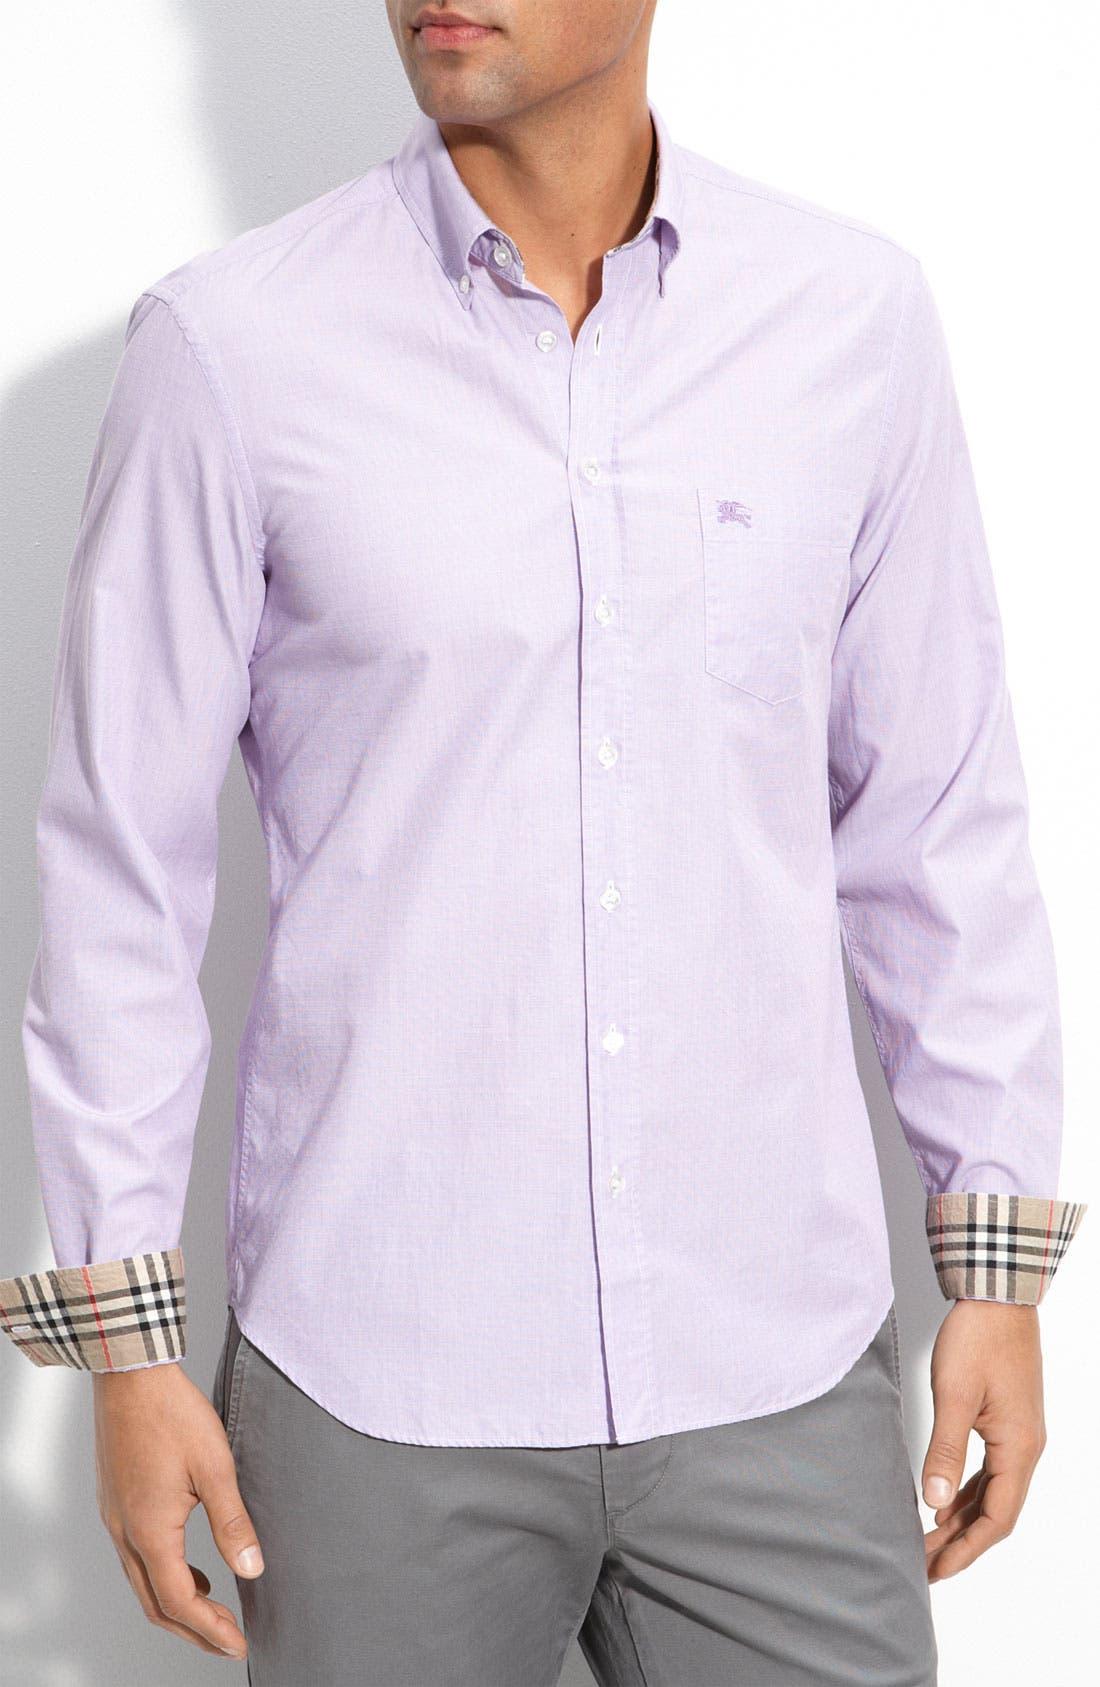 Alternate Image 1 Selected - Burberry Brit Woven Trim Fit Sport Shirt